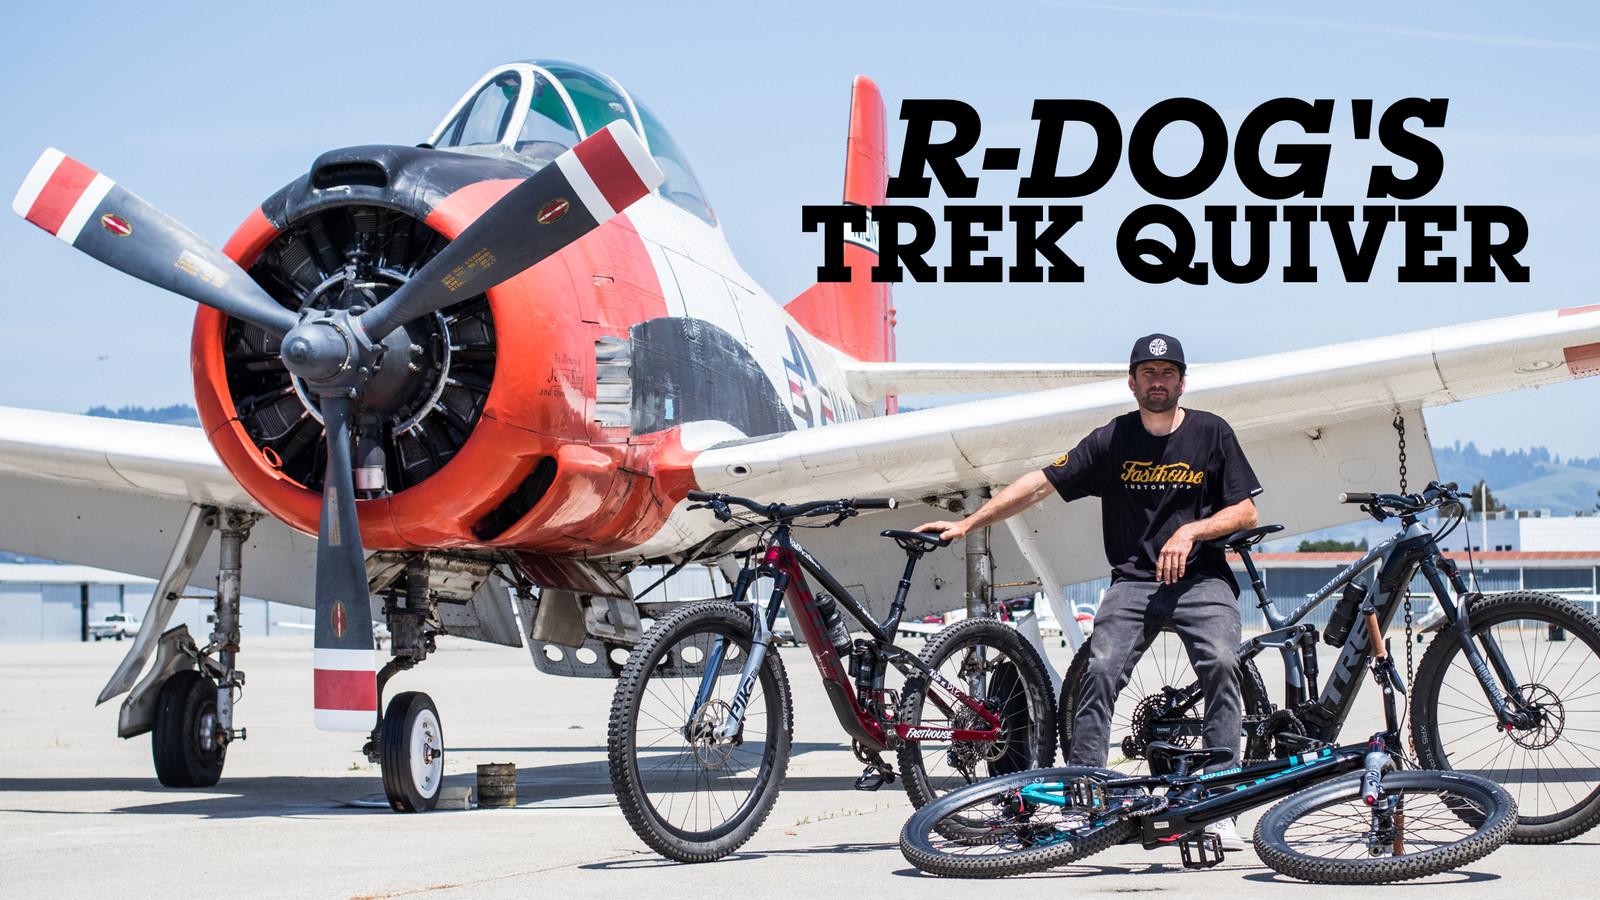 Ryan Howard's Trek Mountain Bike Quiver - Pro Bike Check